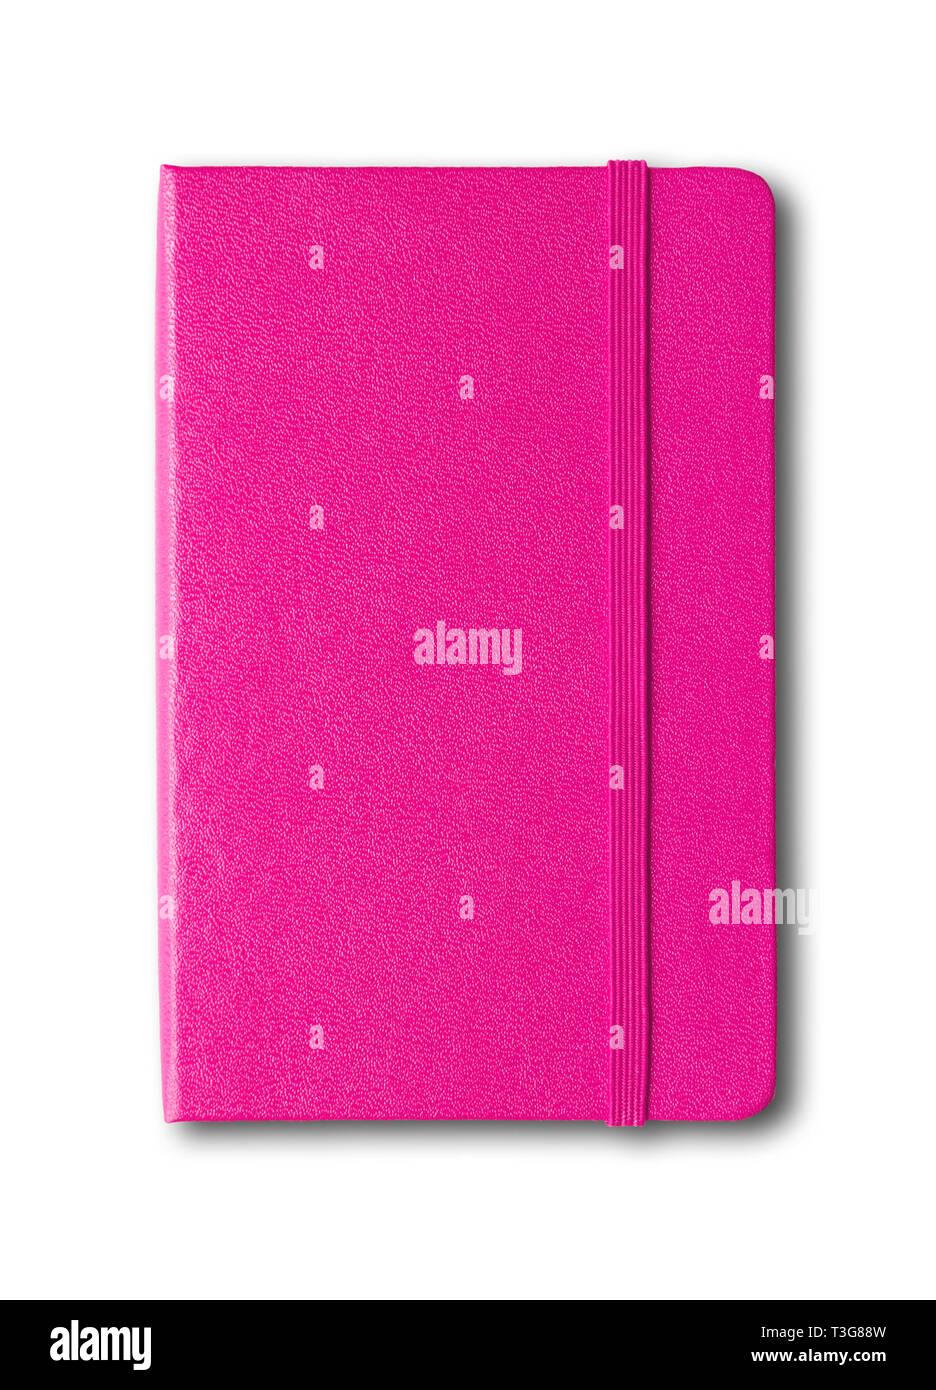 Magenta pink closed notebook mockup isolated on white - Stock Image